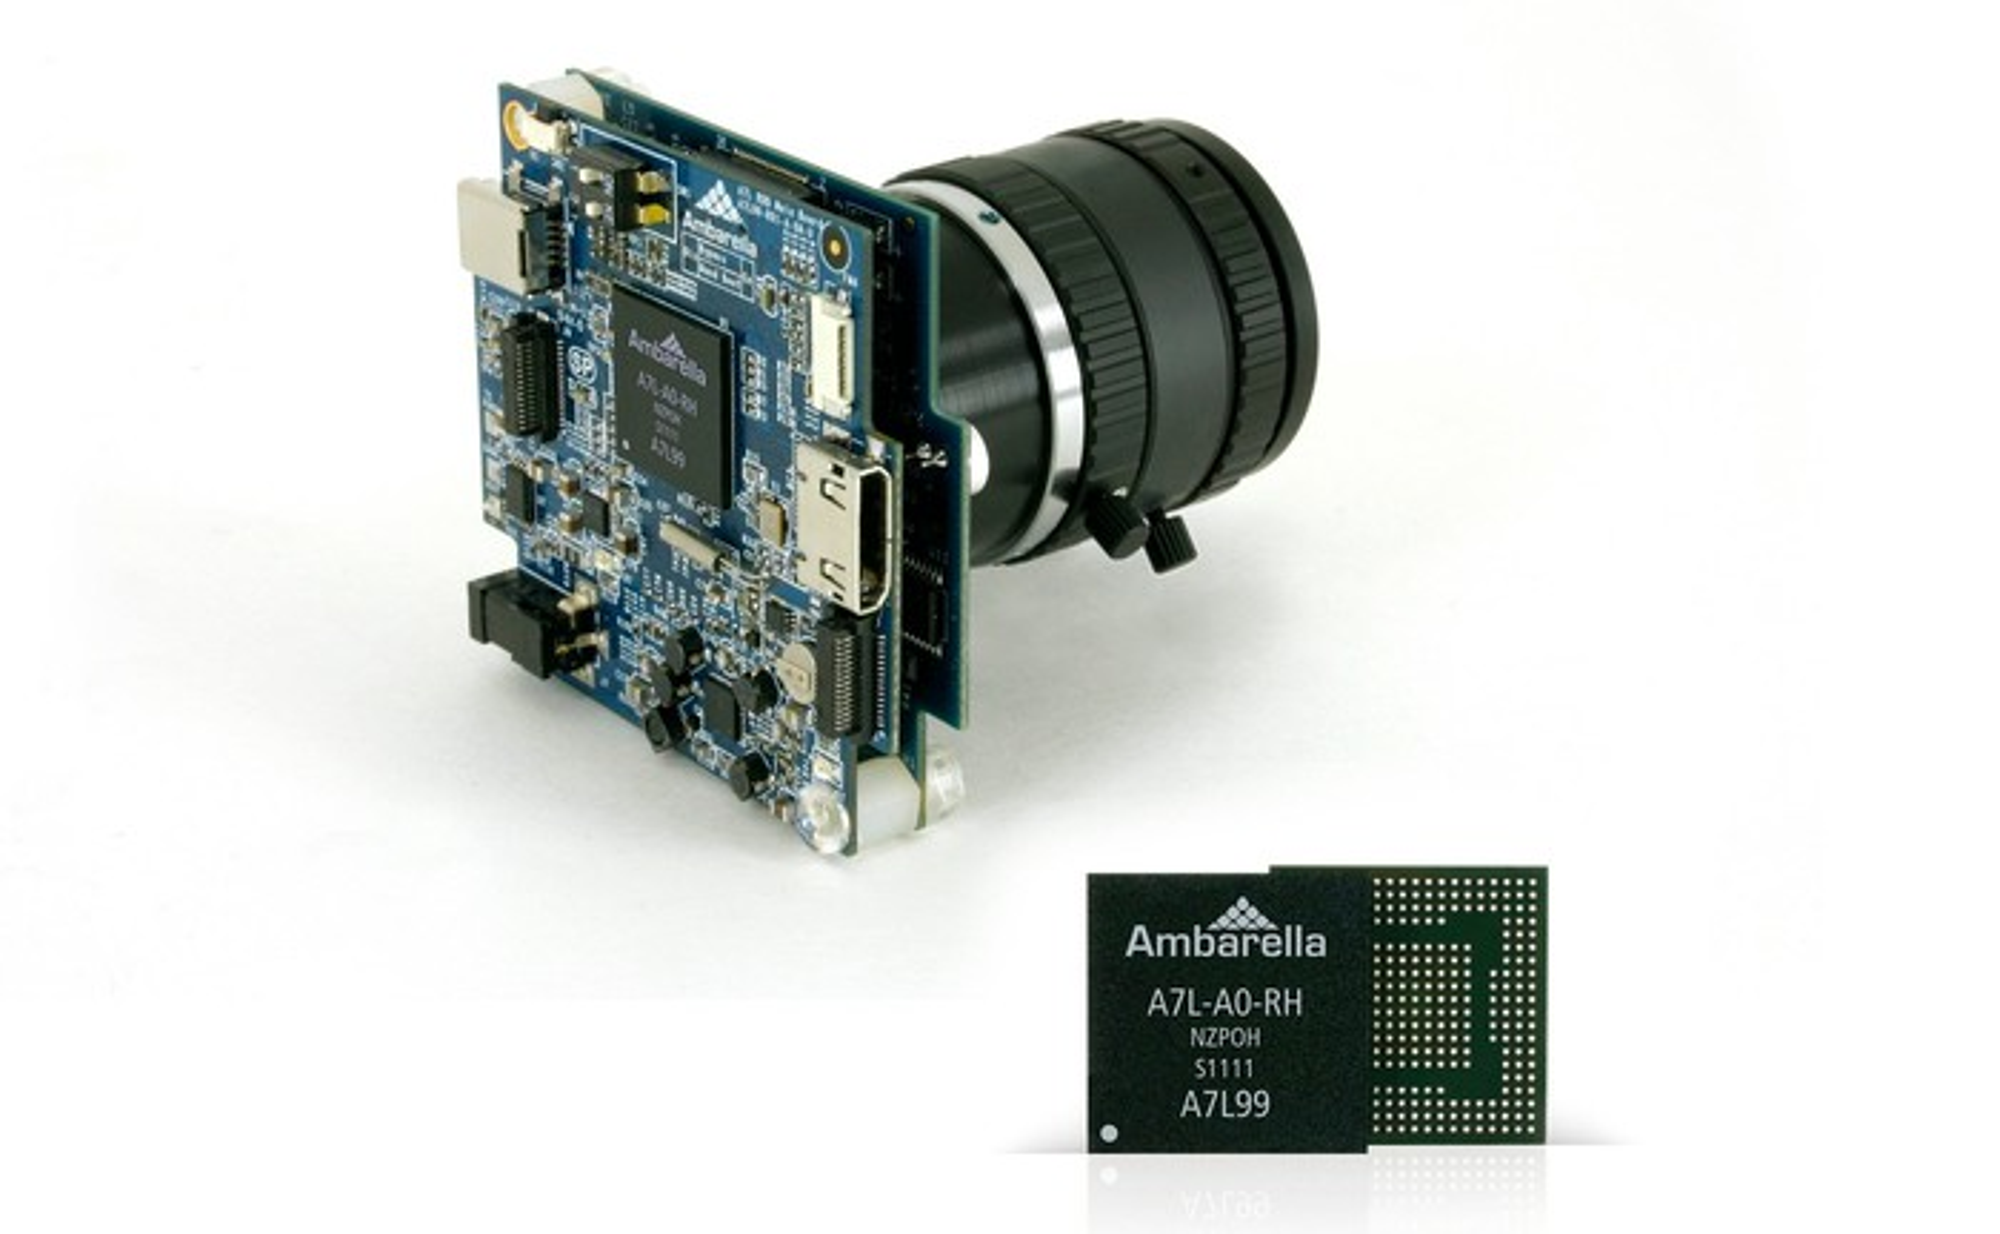 Ambarella chip attached to a camera lens